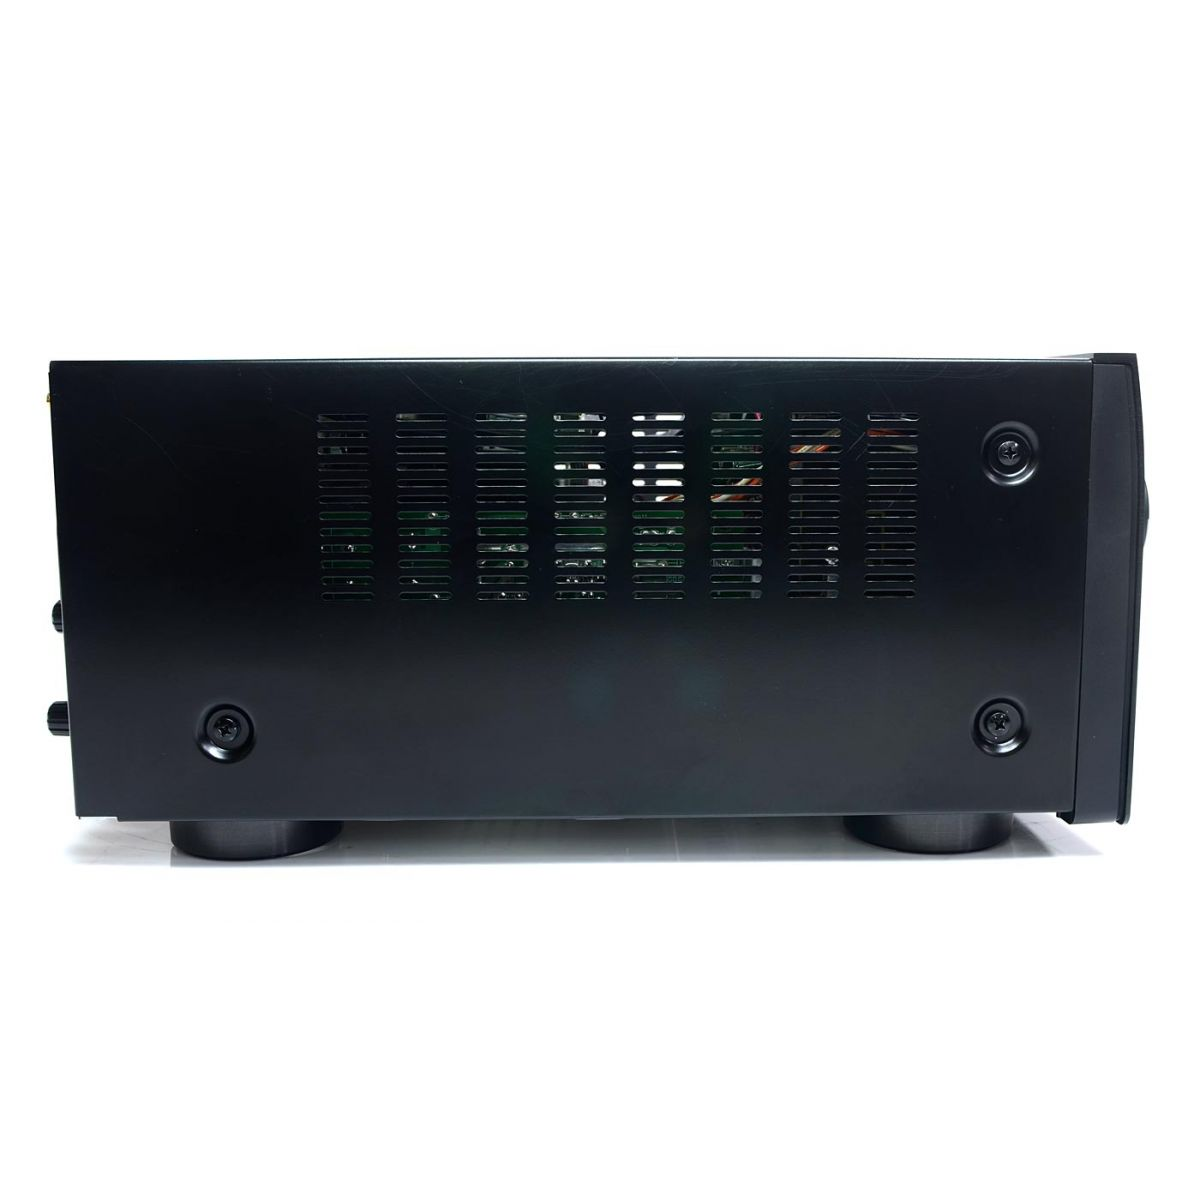 Receiver Denon AVR-X4100W 7.2 Canais 4K Ultra HD Bluetooth WiFi HDMI v2.0 USB Phono In